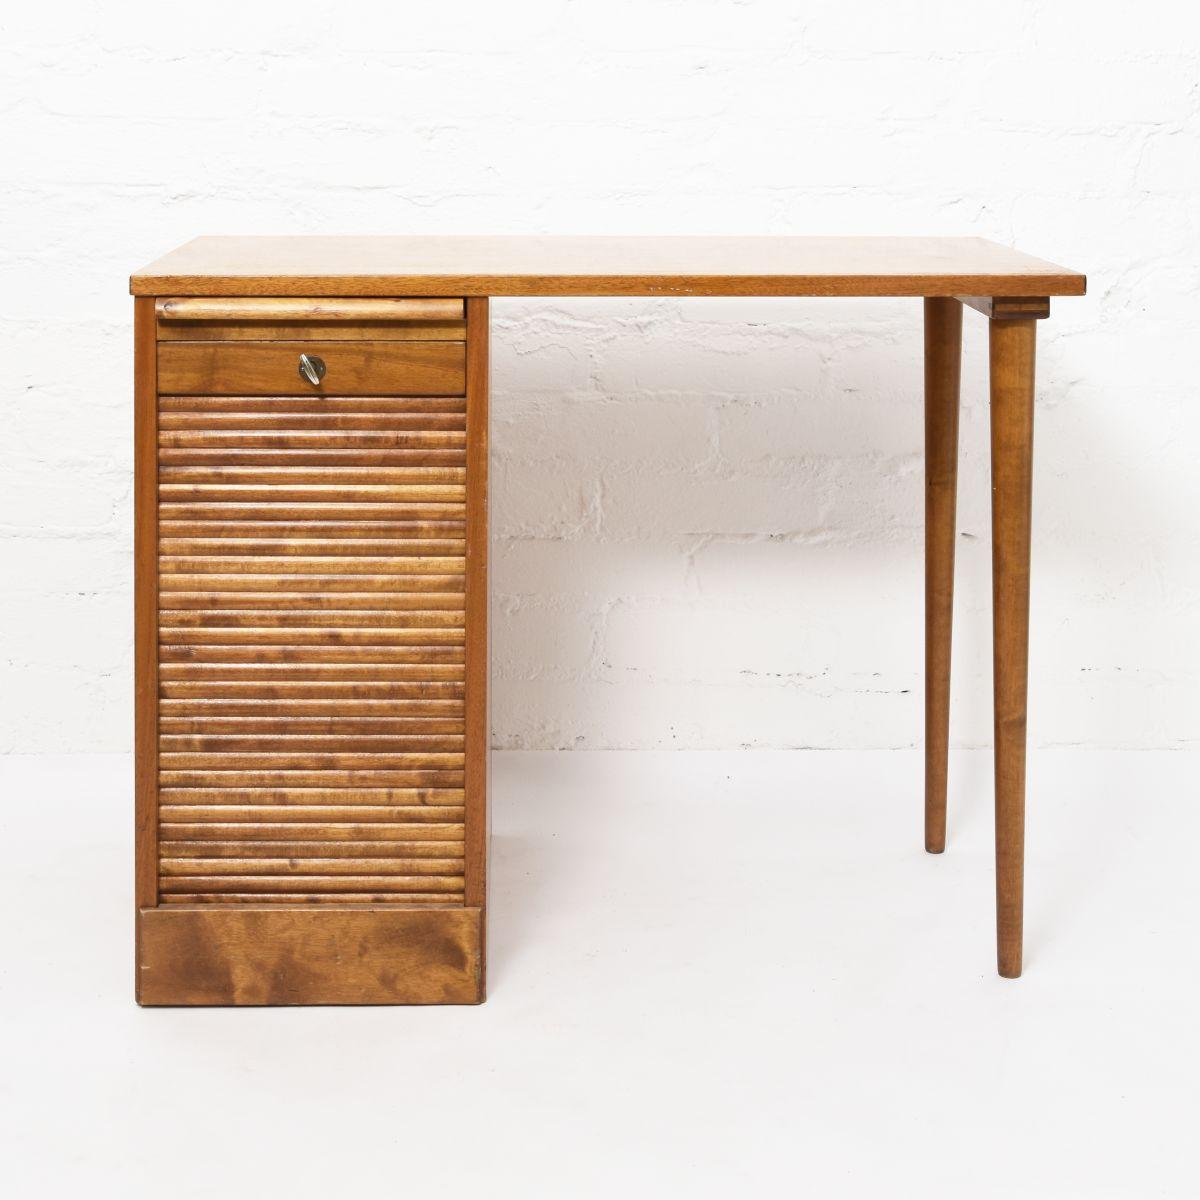 Tapiovaara-Ilmari-Desk-with-Drawer-Rock-System